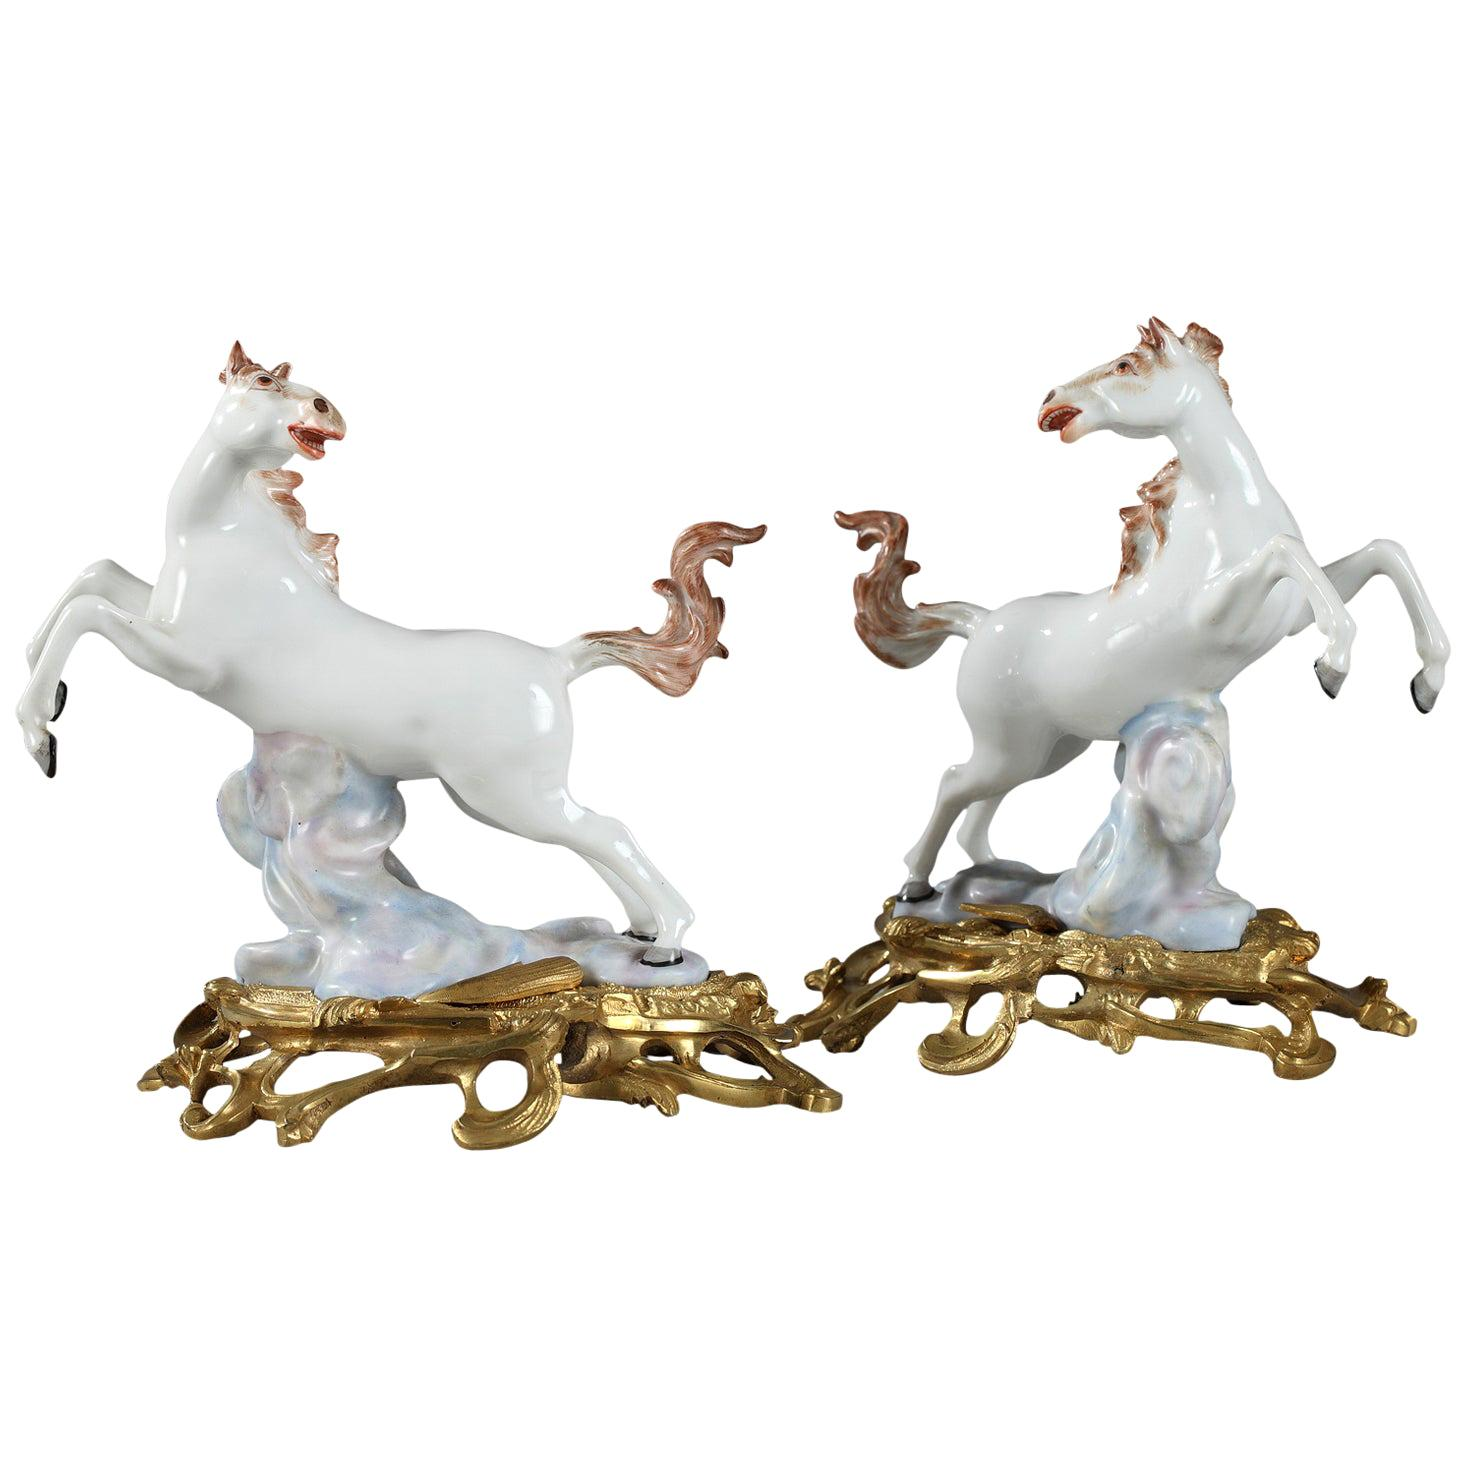 Ormolu-Mounted Porcelain Horses by Samson Manufactory